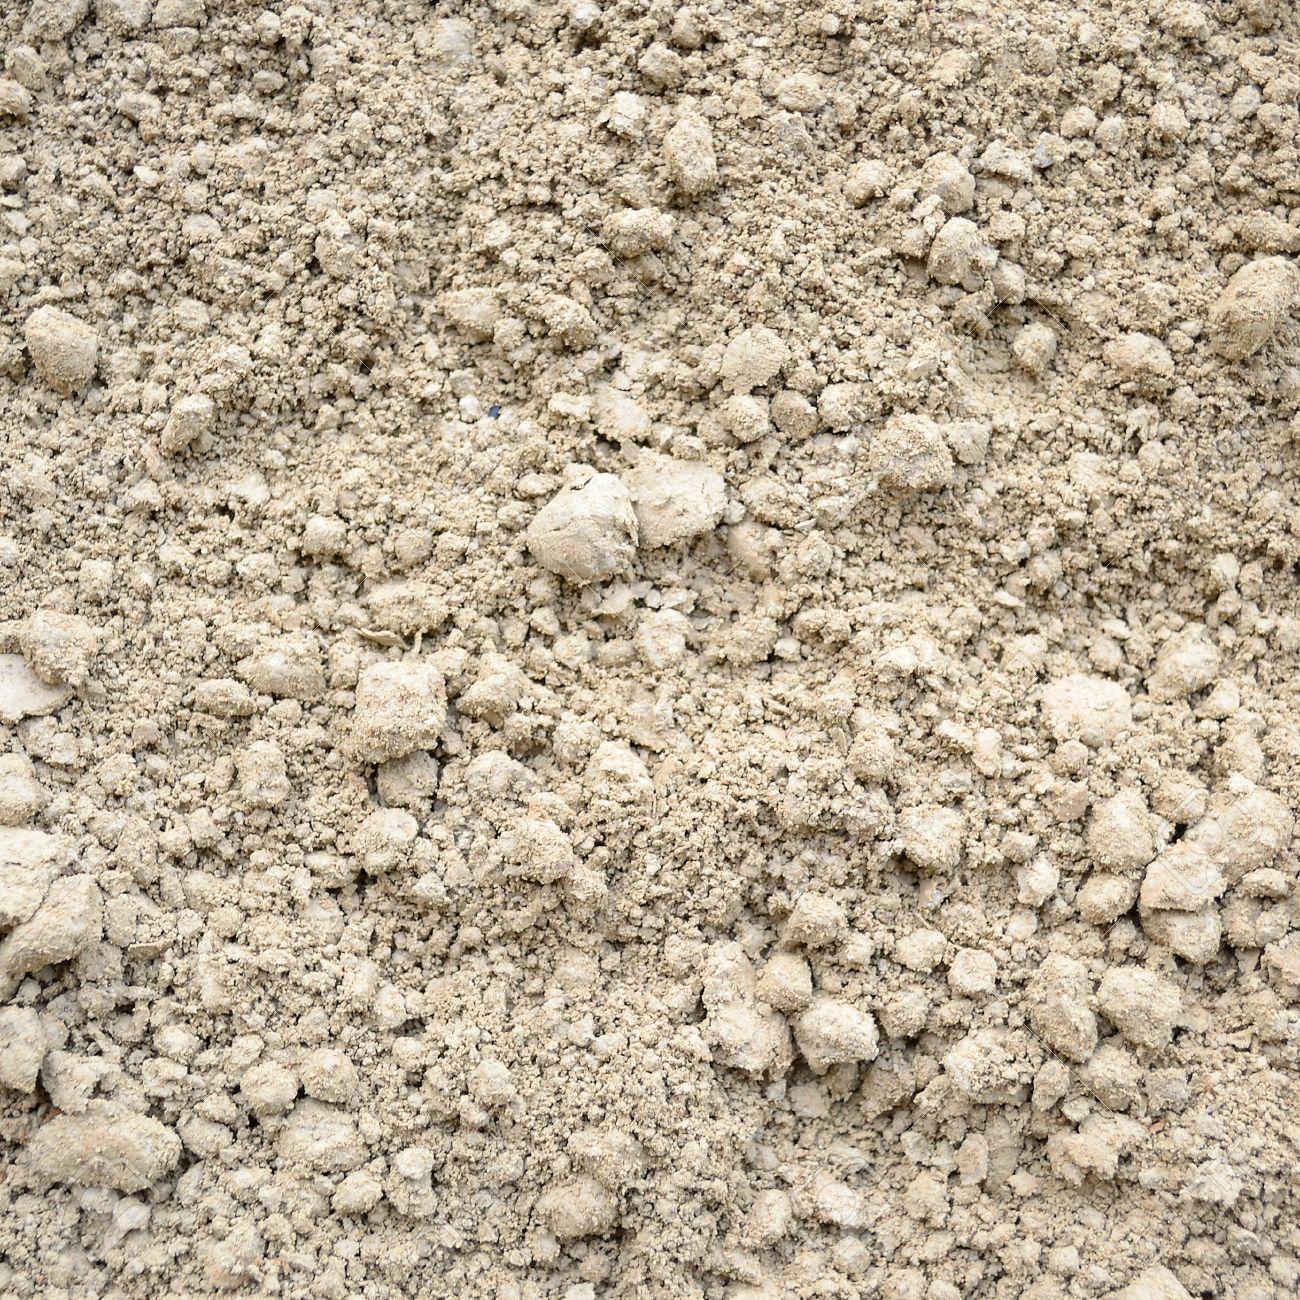 soil type silty soil